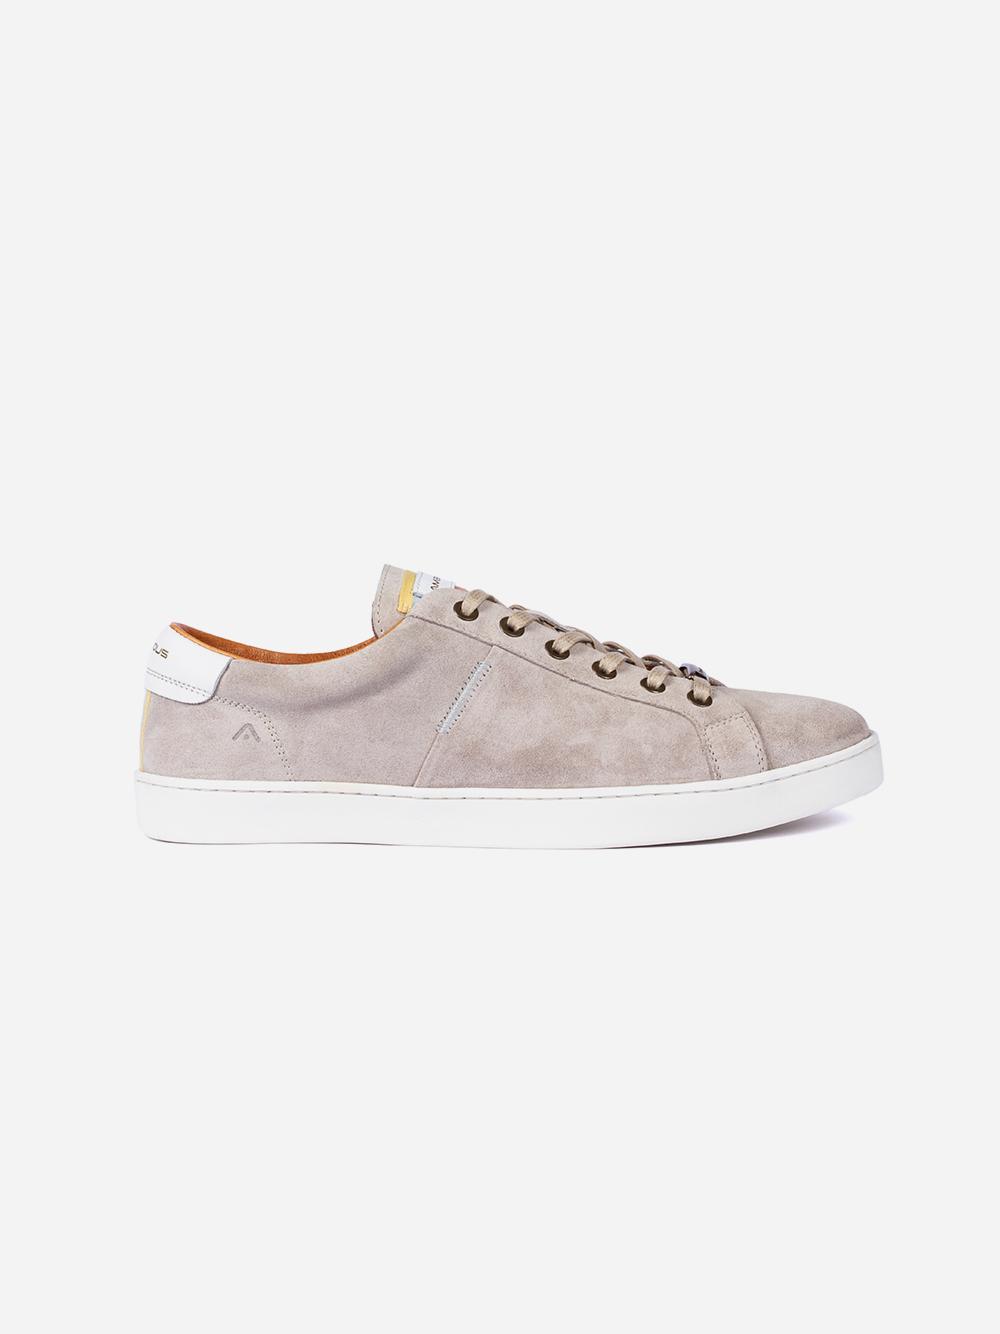 Light Beige Sneakers